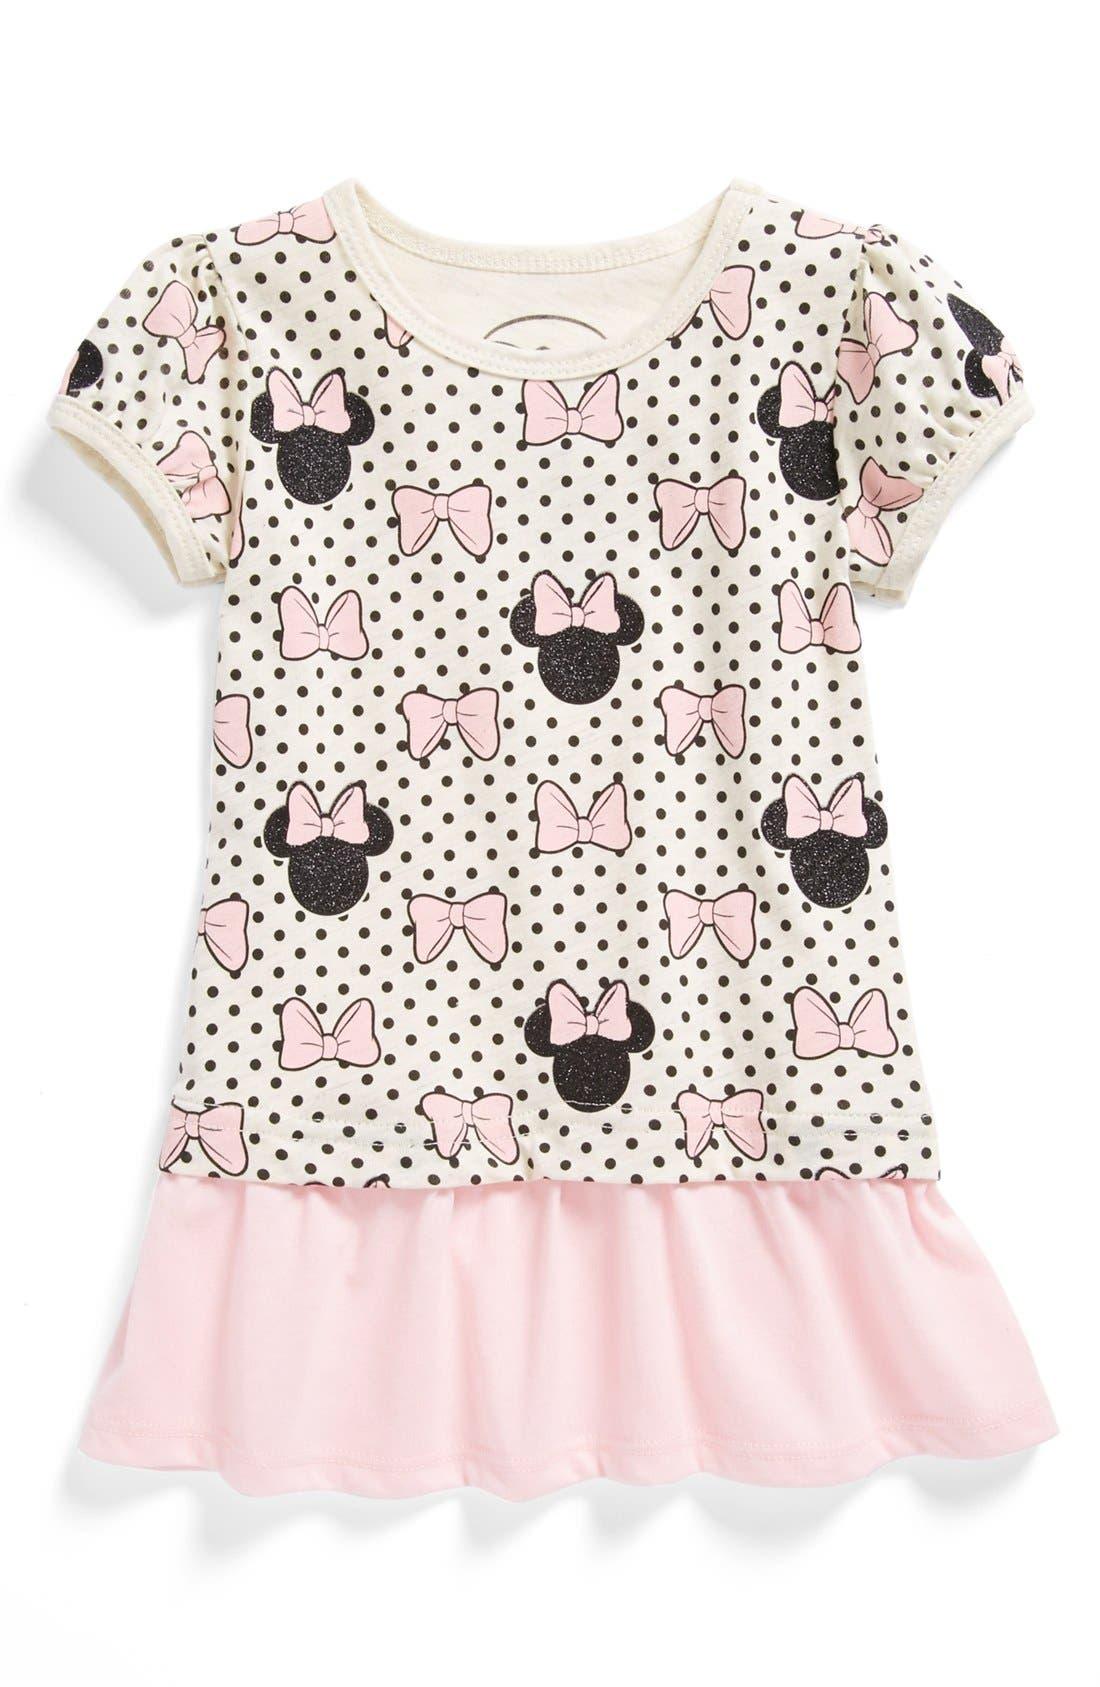 Alternate Image 1 Selected - Mighty Fine 'Minnie' Polka Dot Peplum Tee (Little Girls)